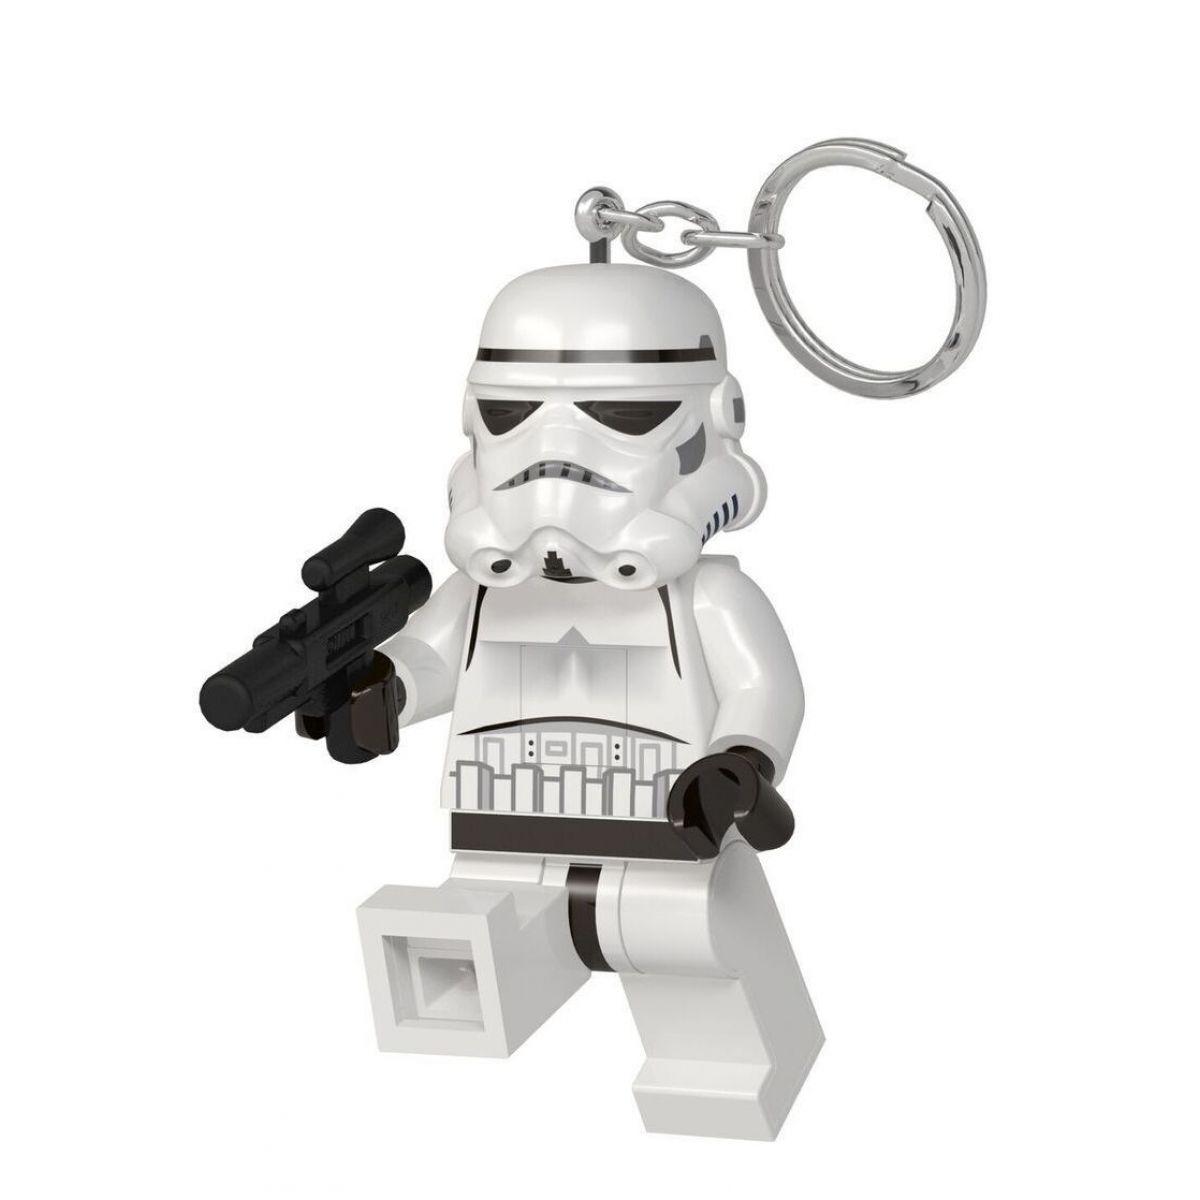 LEGO Star Wars Stormtrooper s blastrom svietiaca figúrka